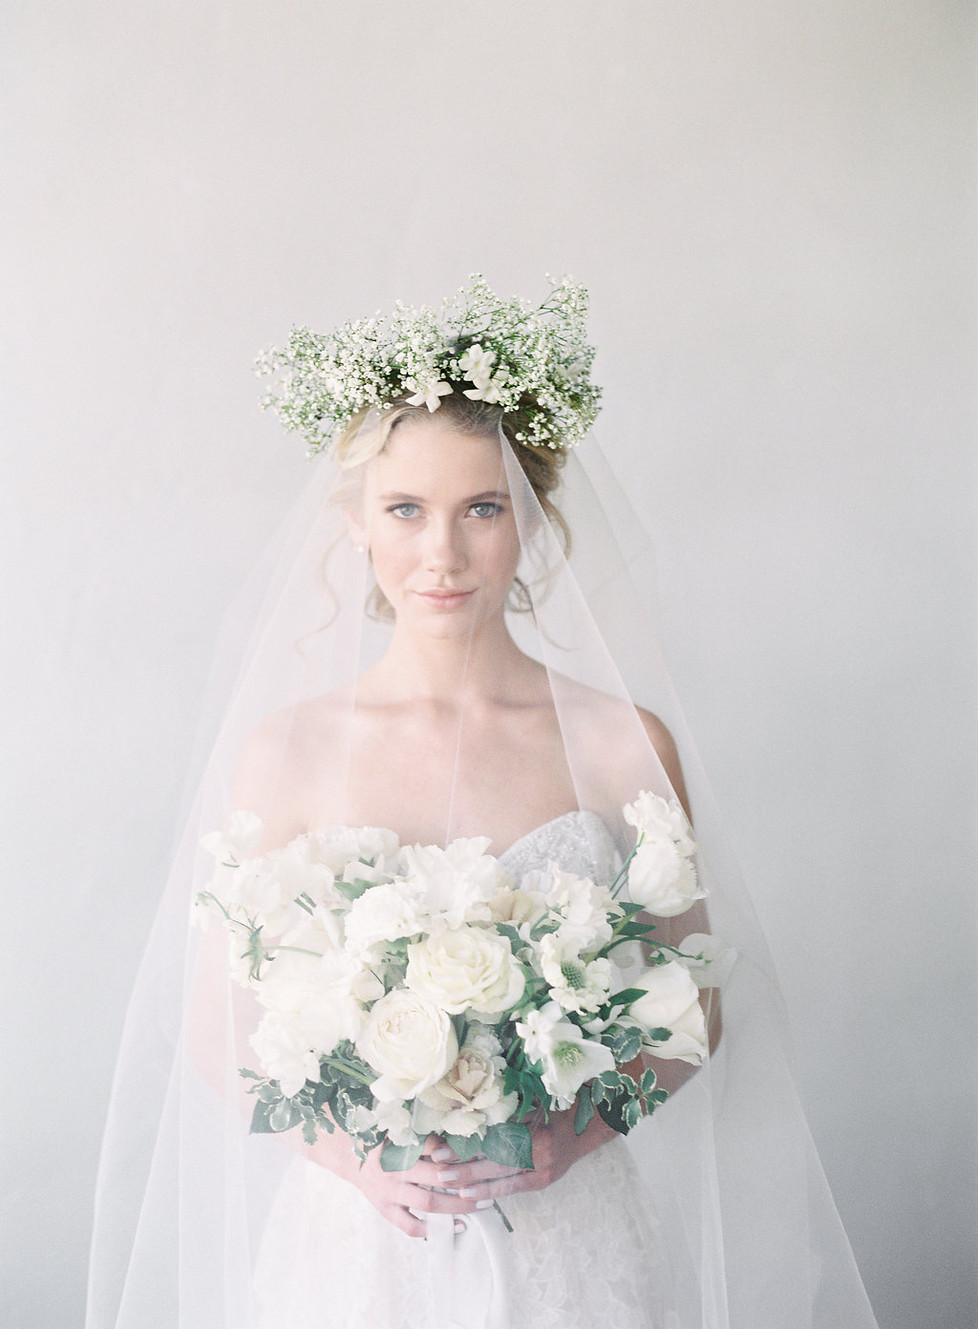 Vendor Love: Curate Events + Design, Denver Wedding Planners